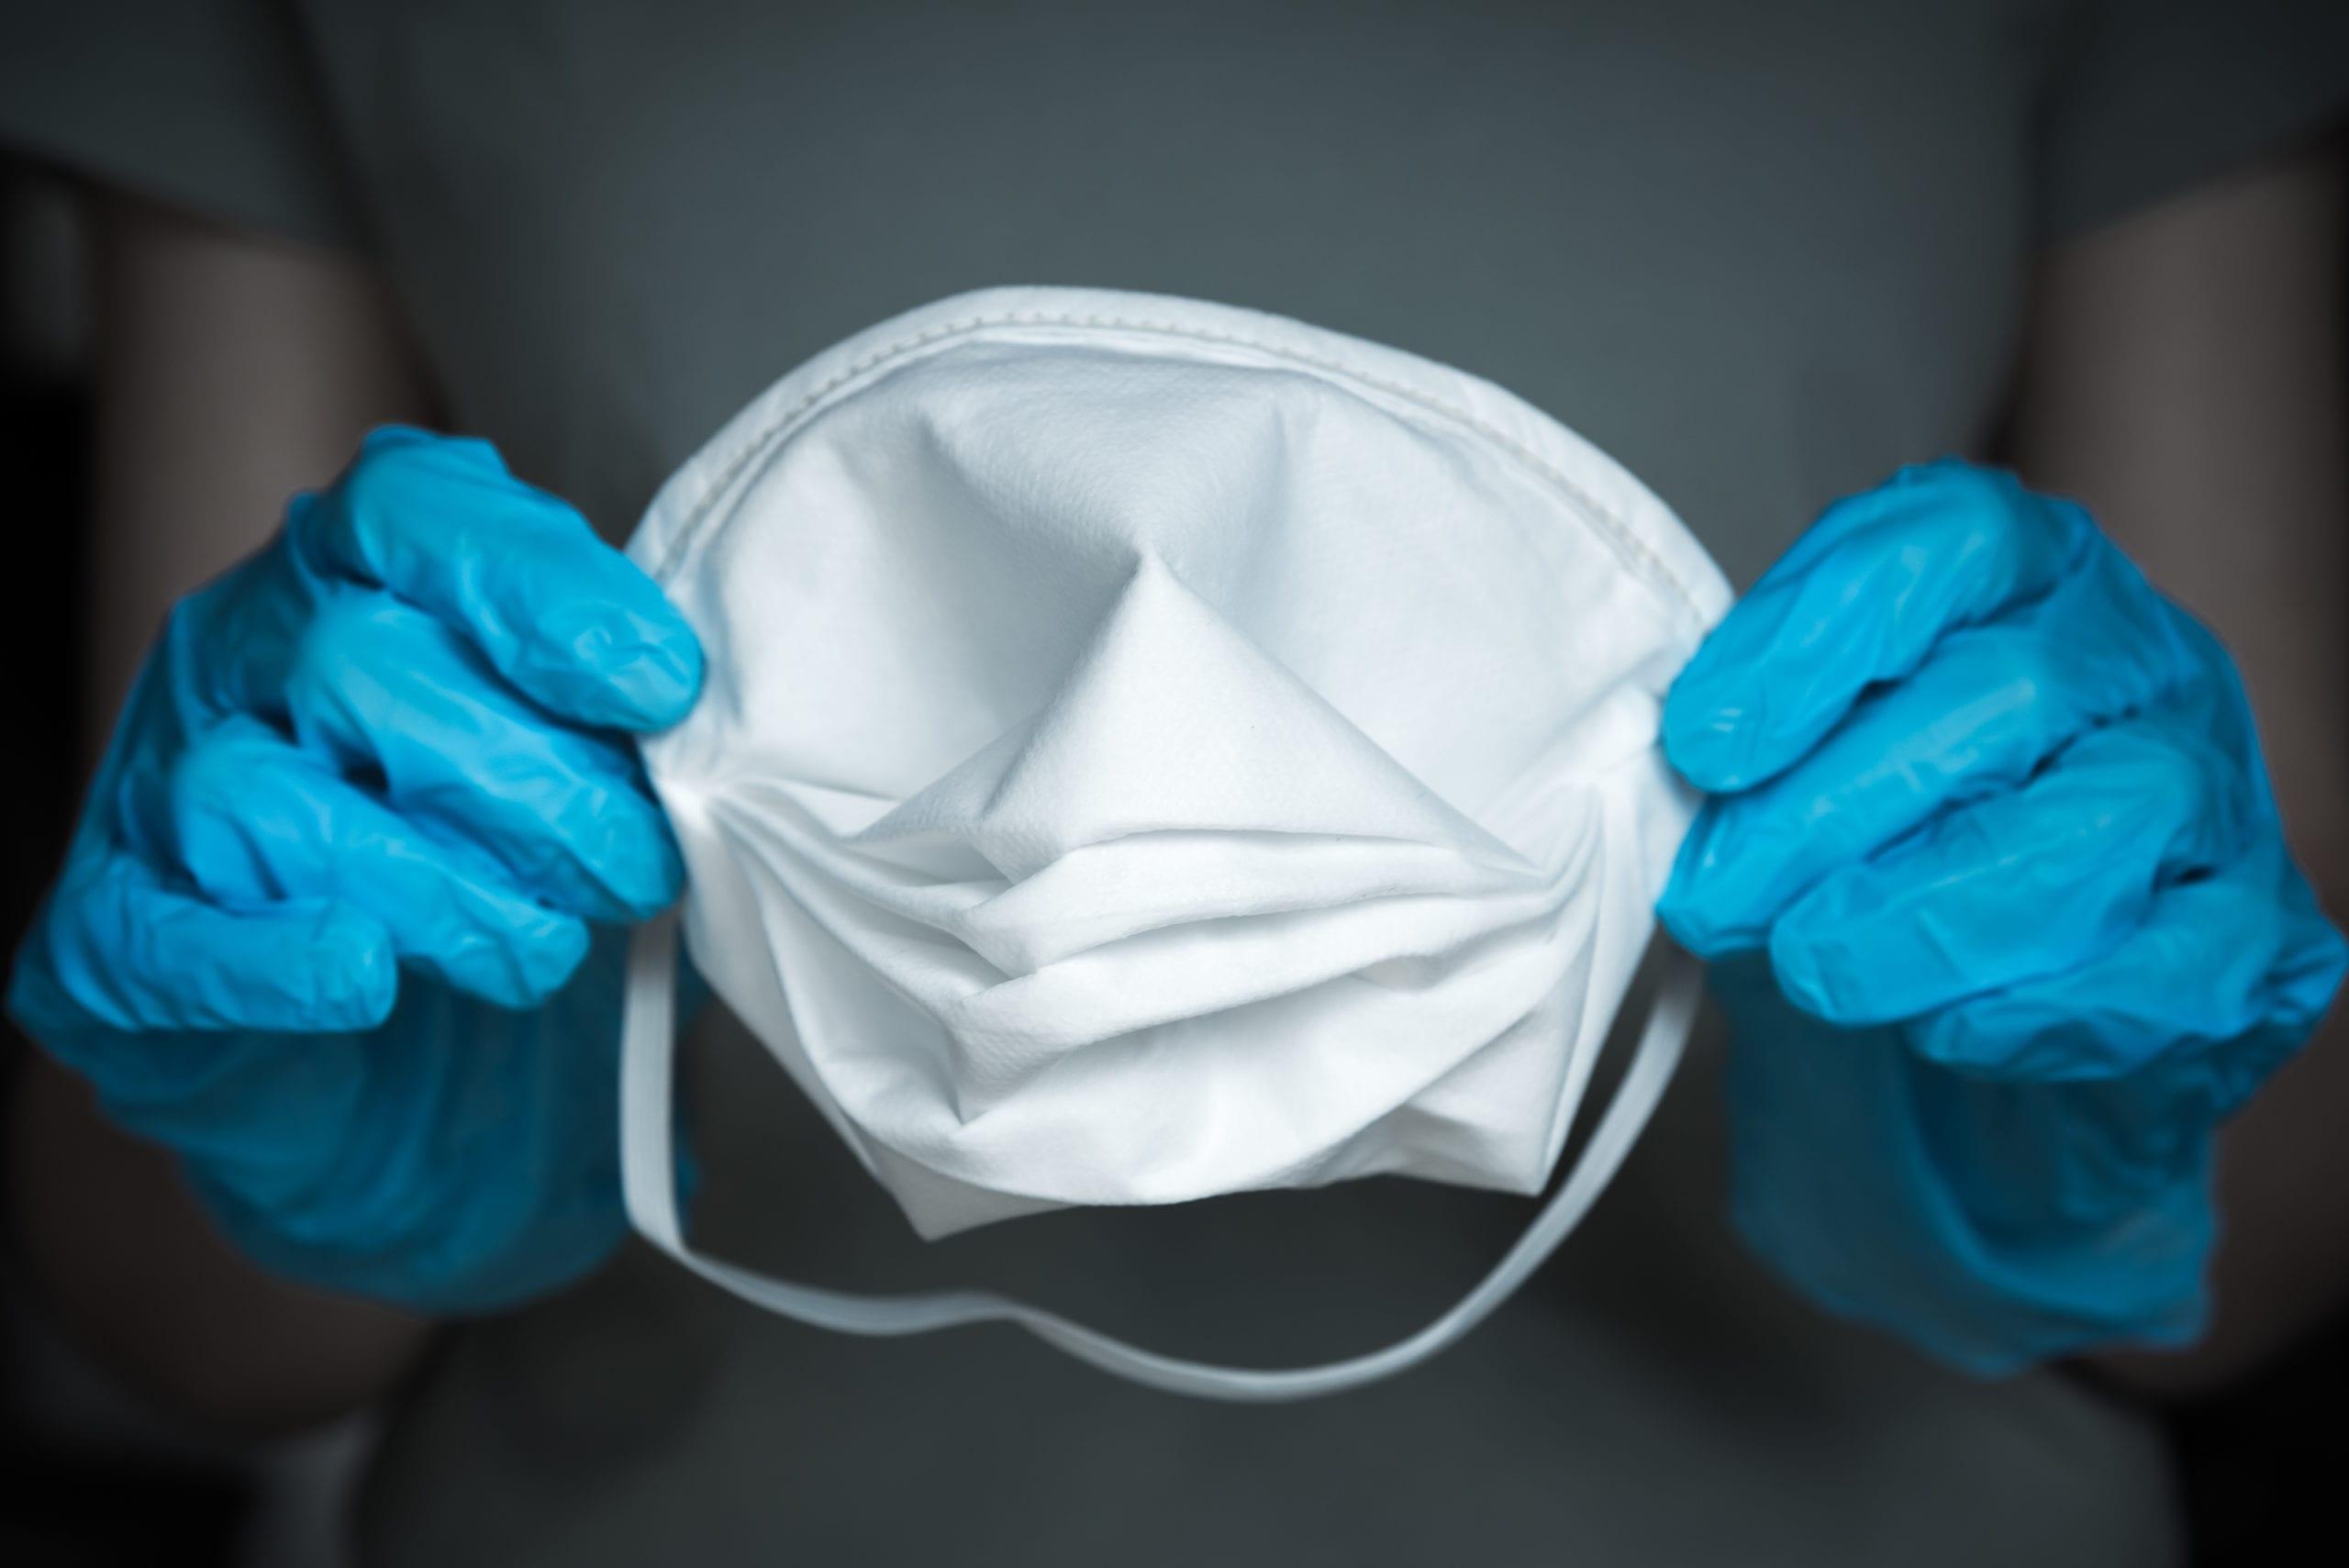 Close-up of gloved hands holding N95 medical face mask